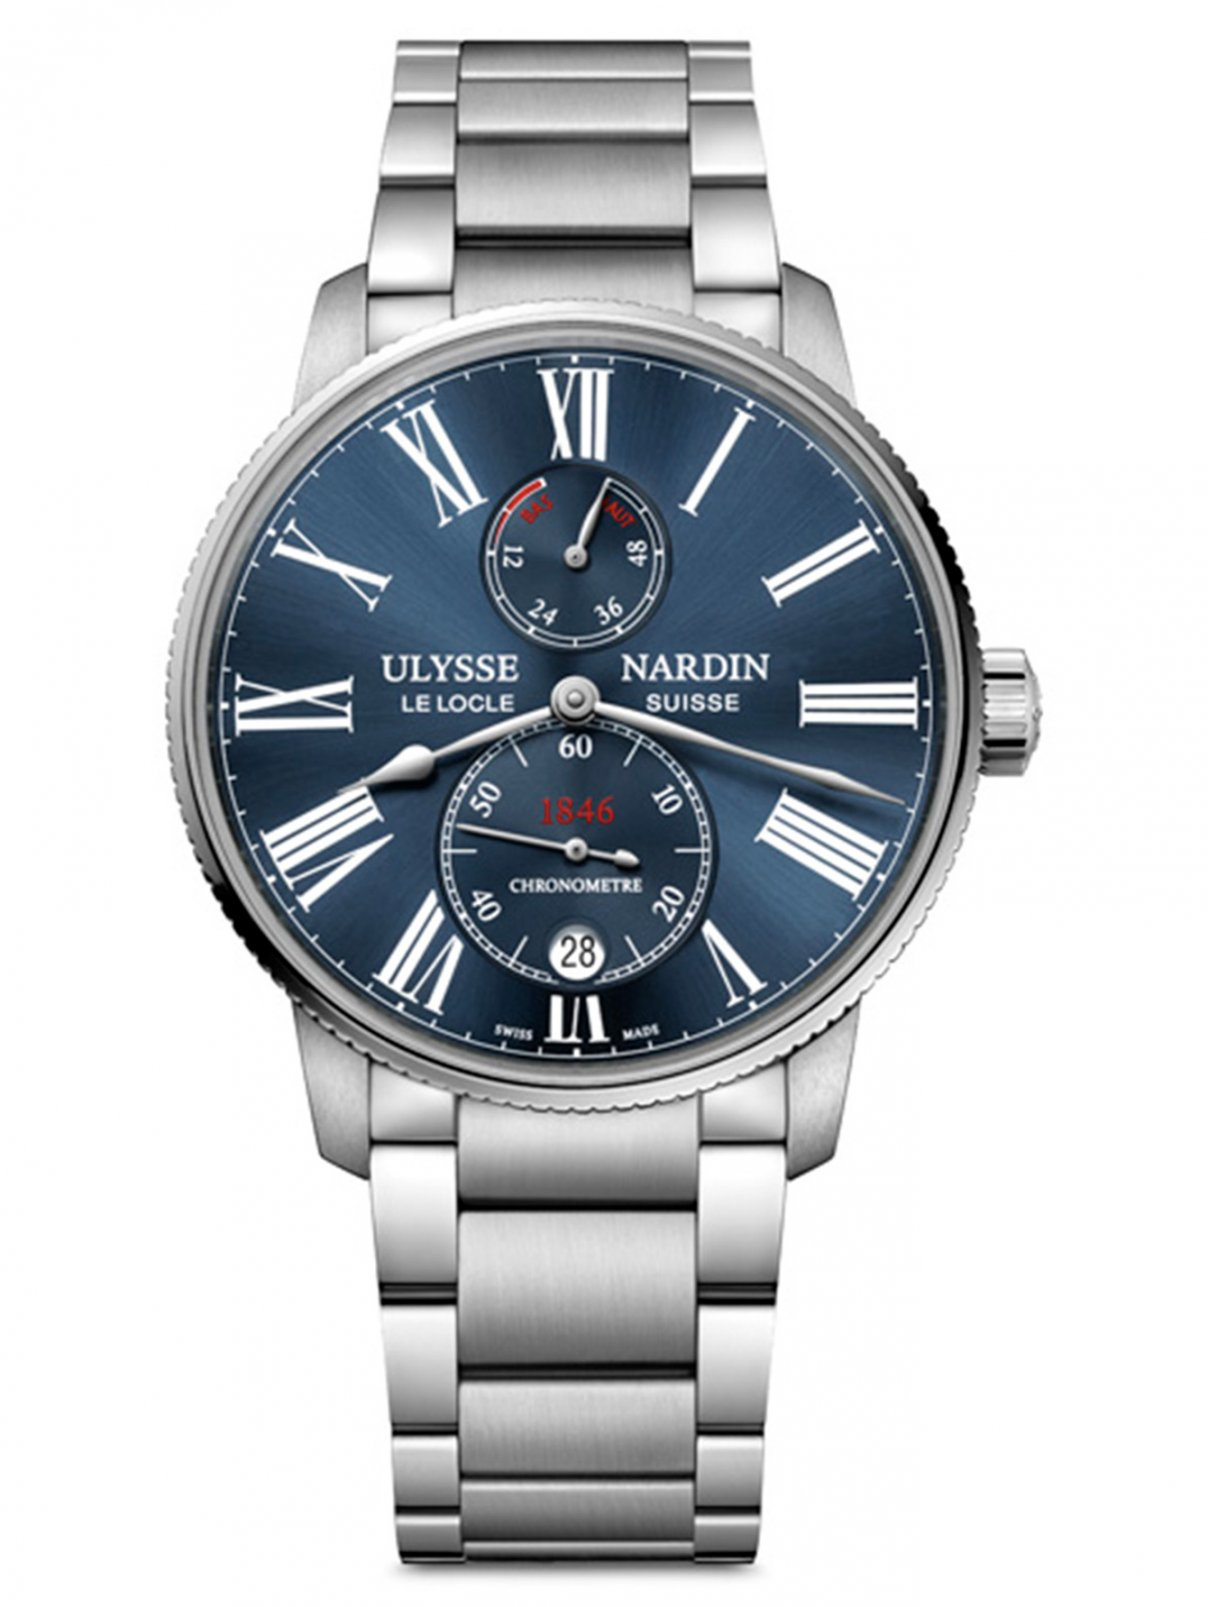 Часы 1183-310-7M/43 Marine Chronometer Ulysse Nardin  –  Общий вид